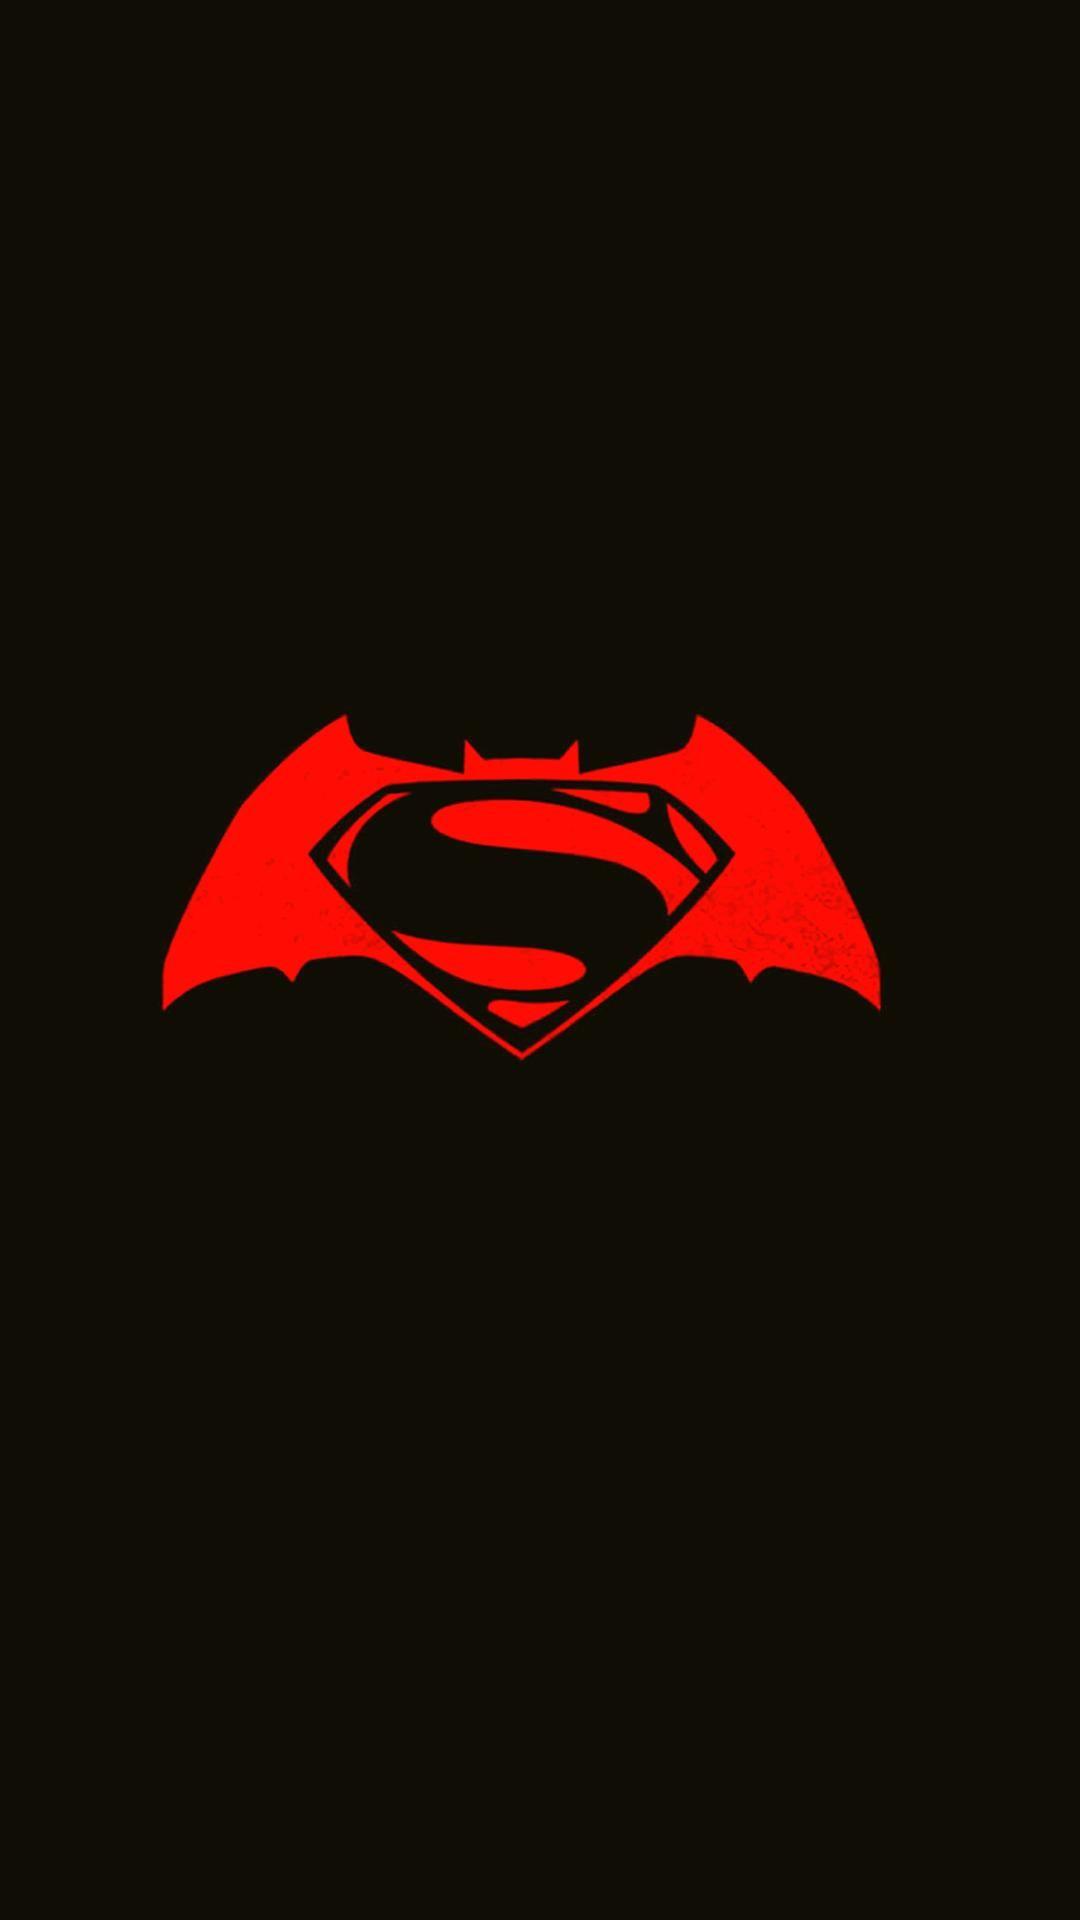 Mobile Full Hd Minimal Wallpaper 1080x1920 Batman Wallpaper Batman And Superman Superman Wallpaper Logo